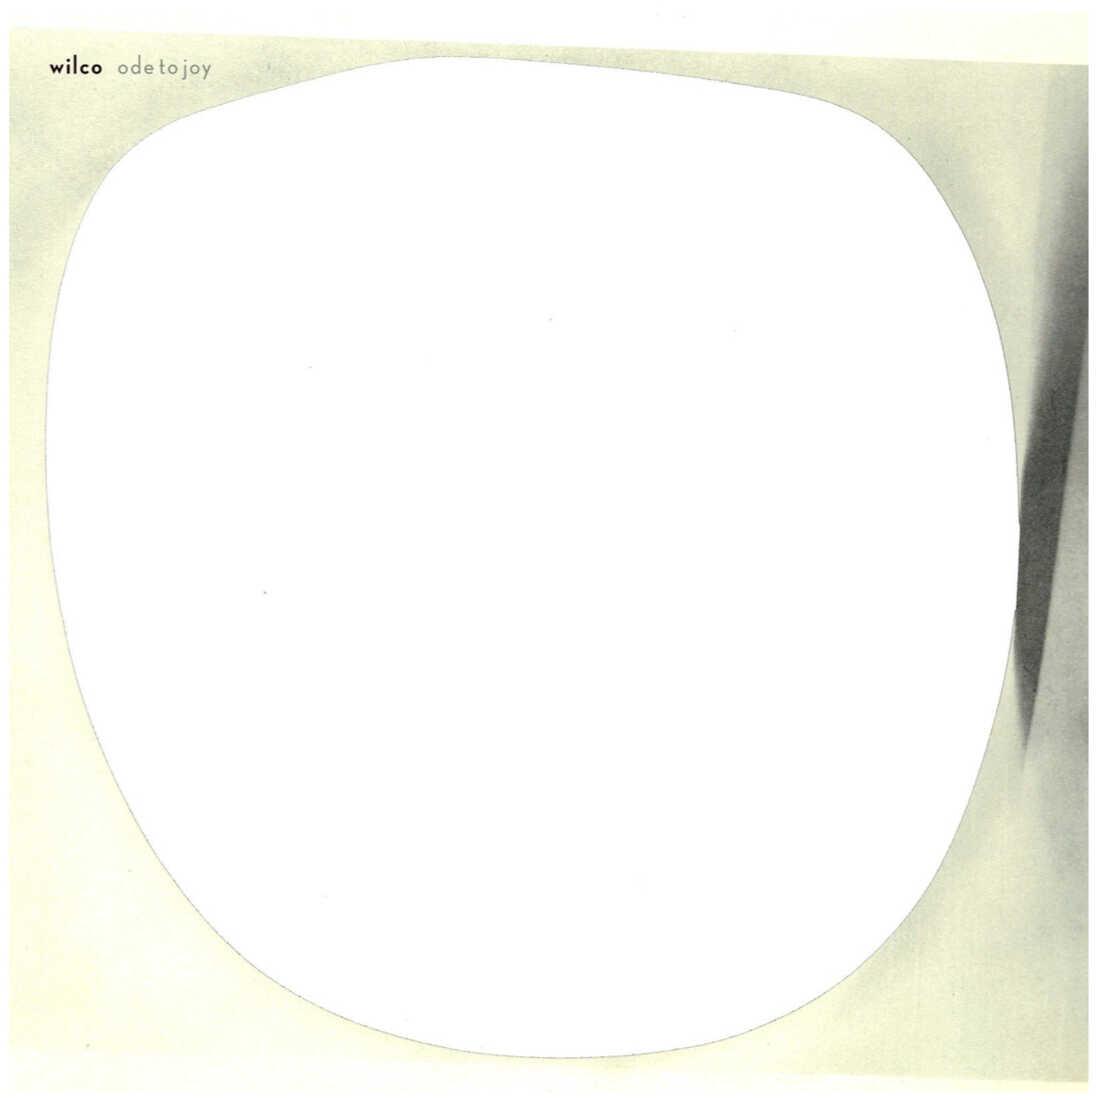 Wilco, Ode to Joy